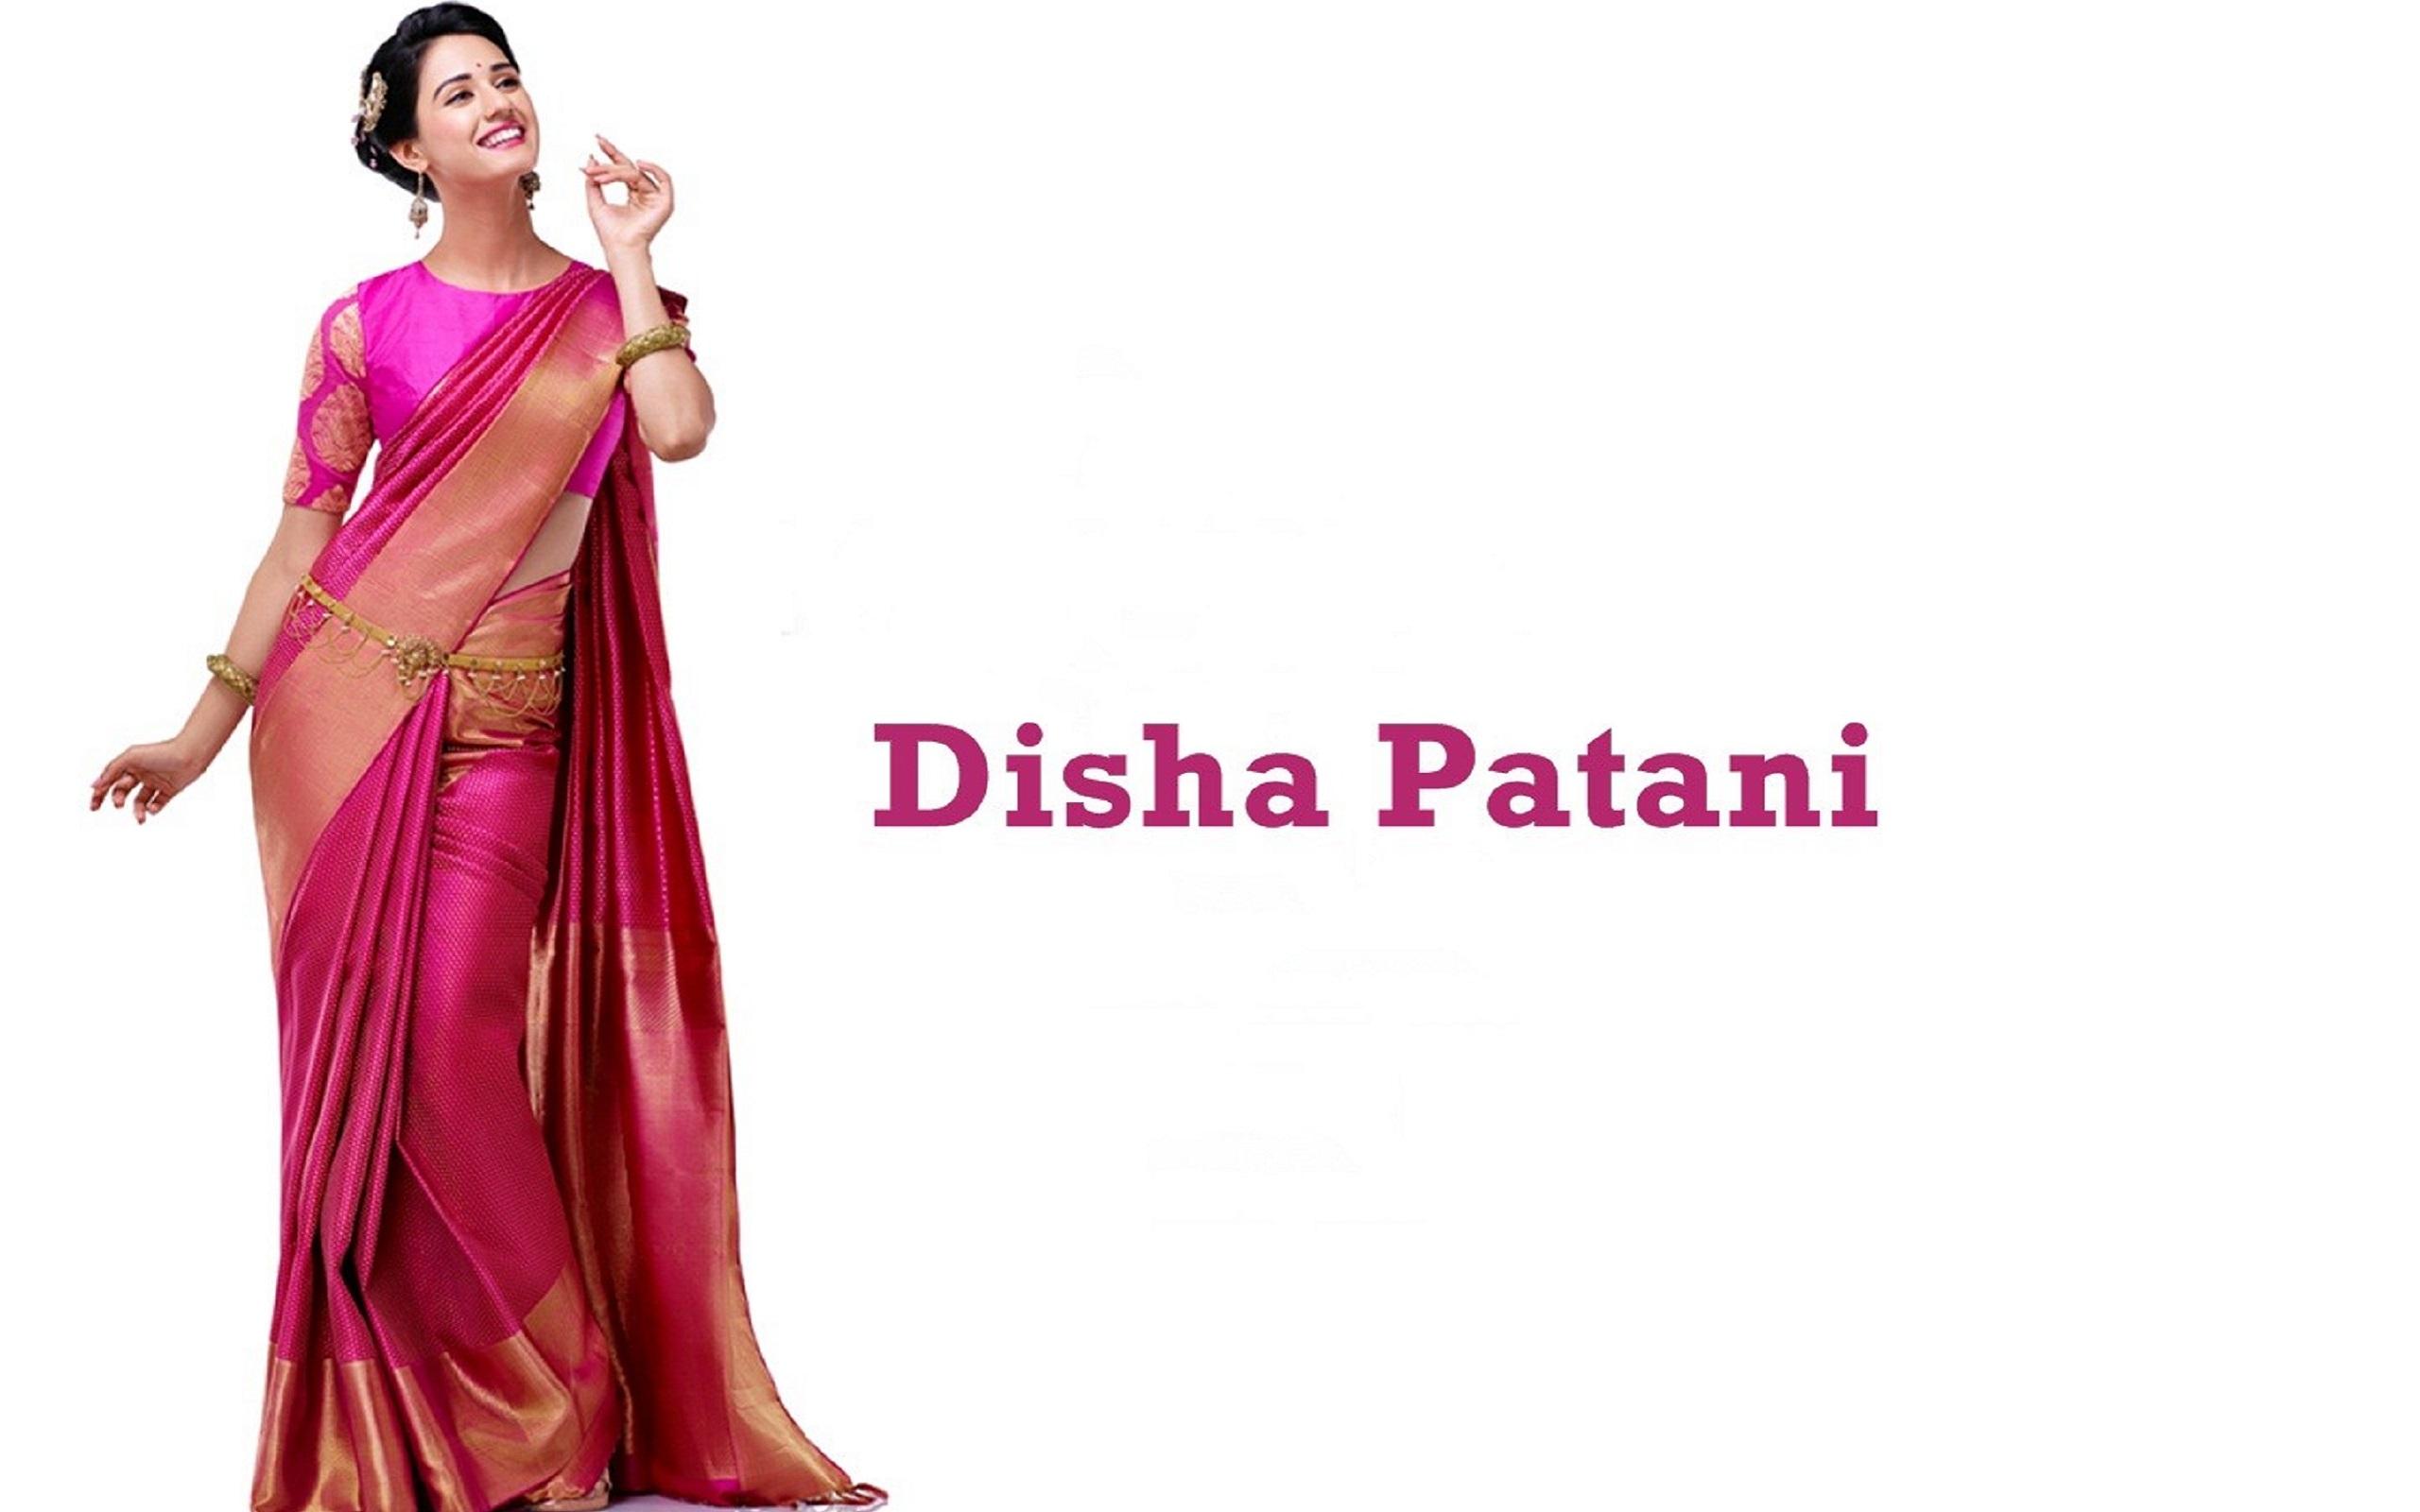 Disha Patani Latest Bikini Photos, Images And Wallpapers